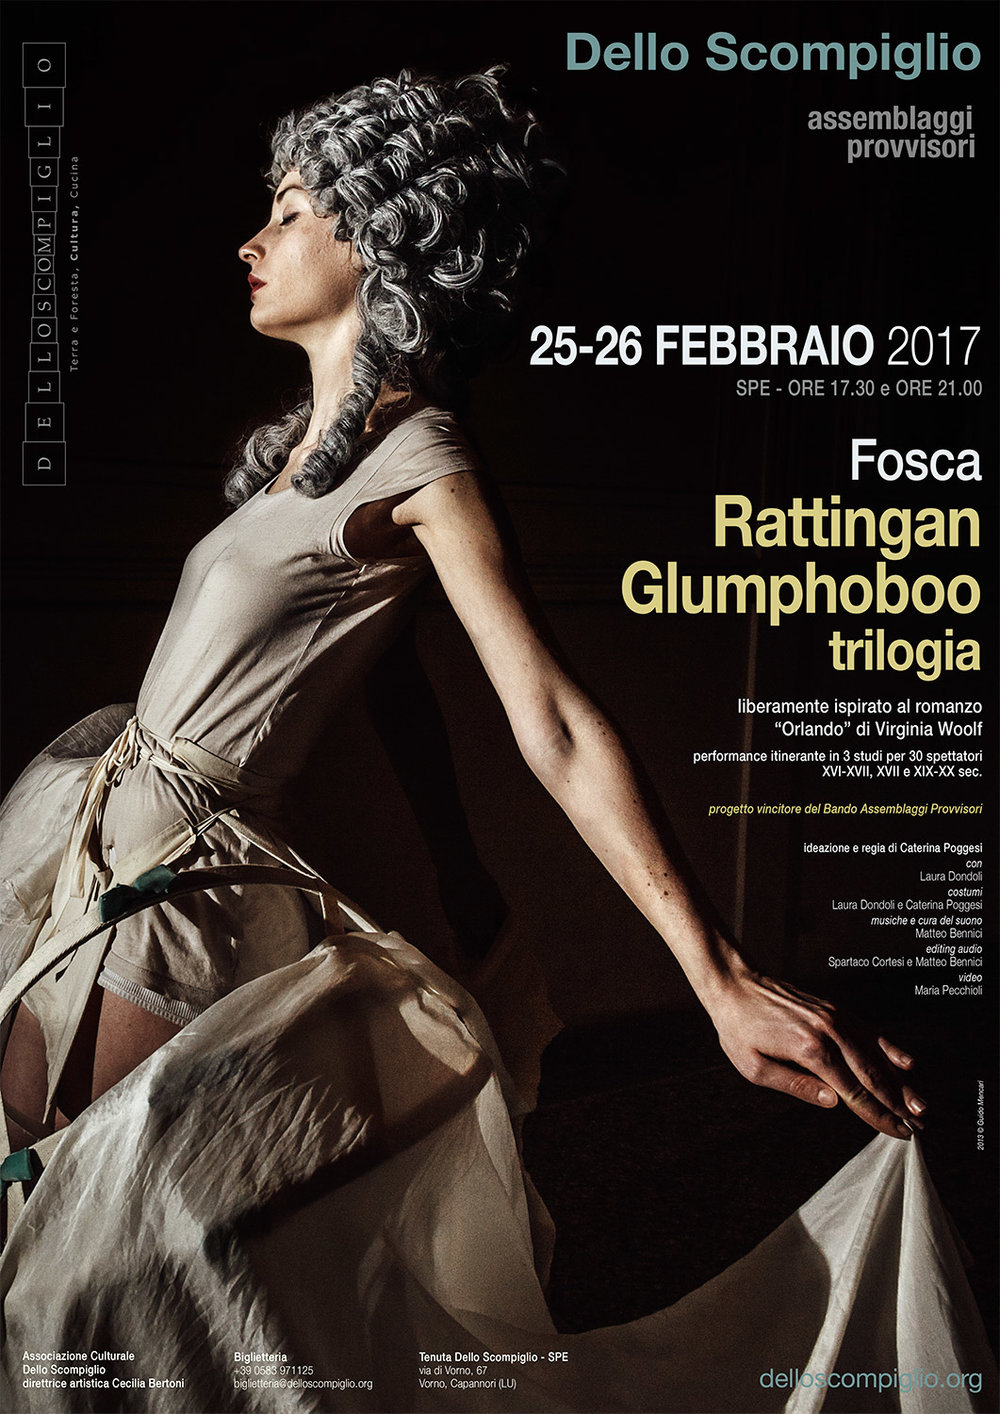 Fosca/Caterina Poggesi   Rattingan Glumphoboo